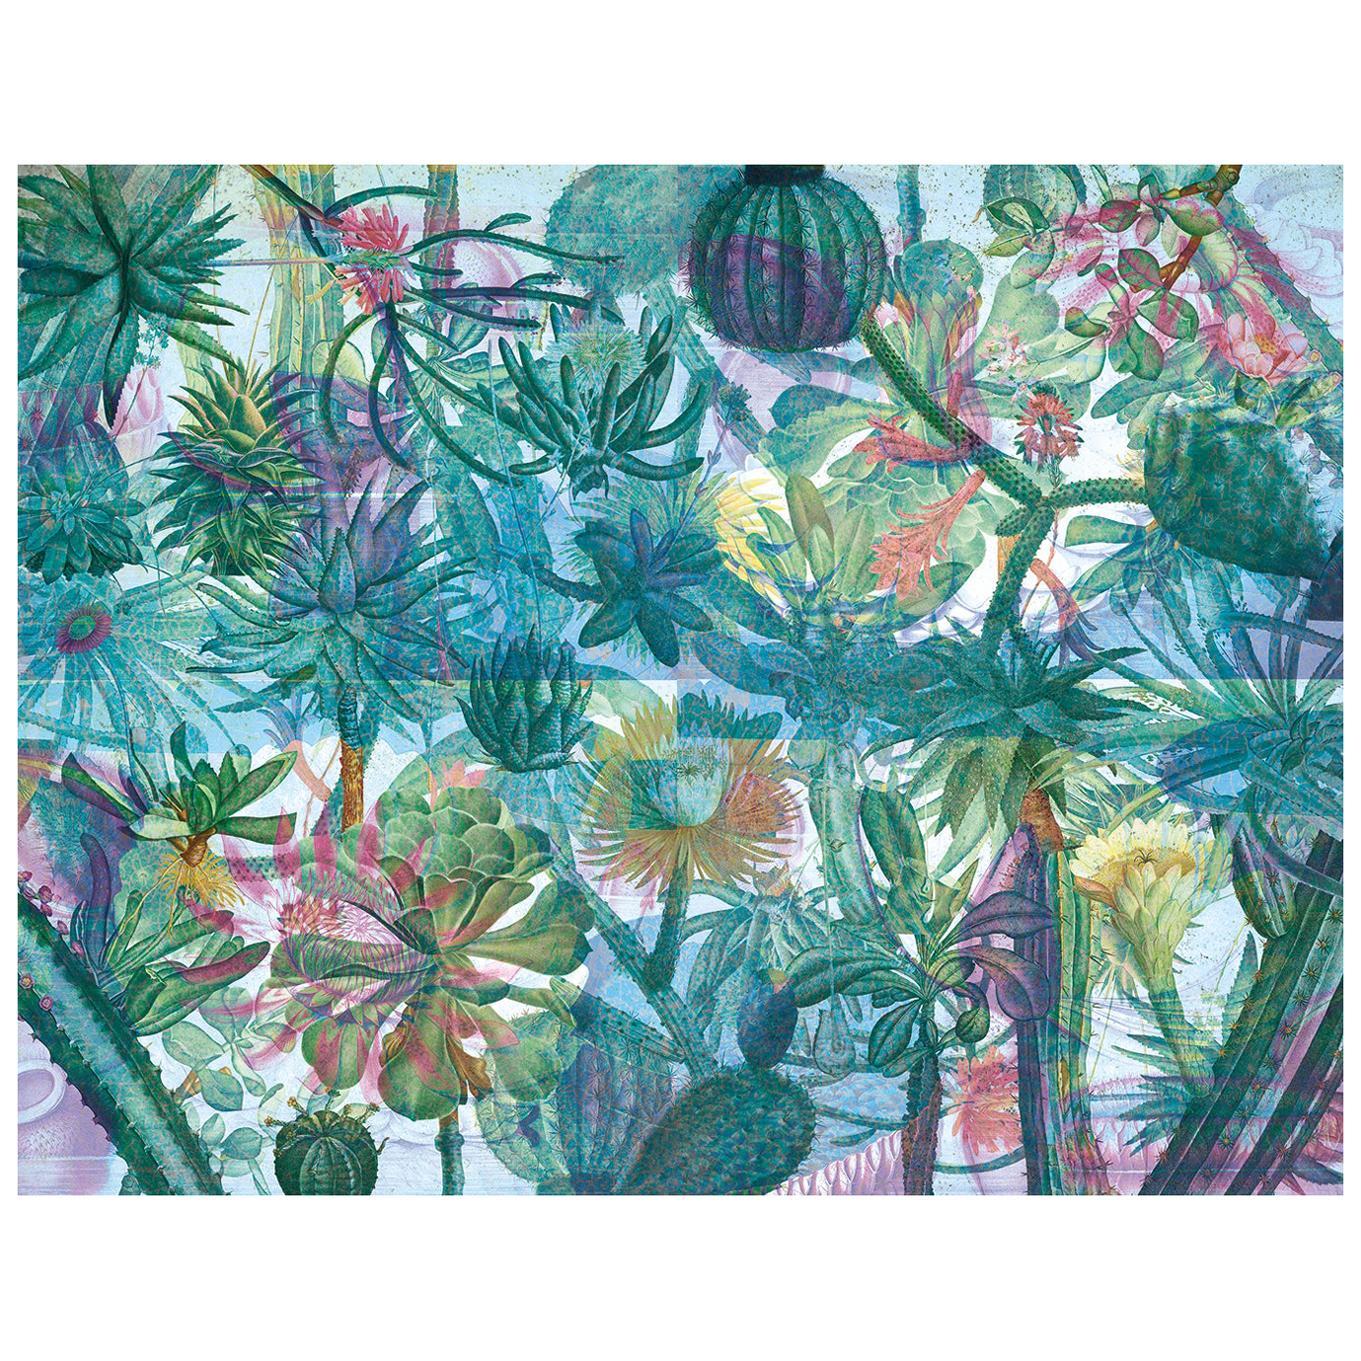 Jardin de l'Ourika - custom mural wallpaper (color water green & light blue)